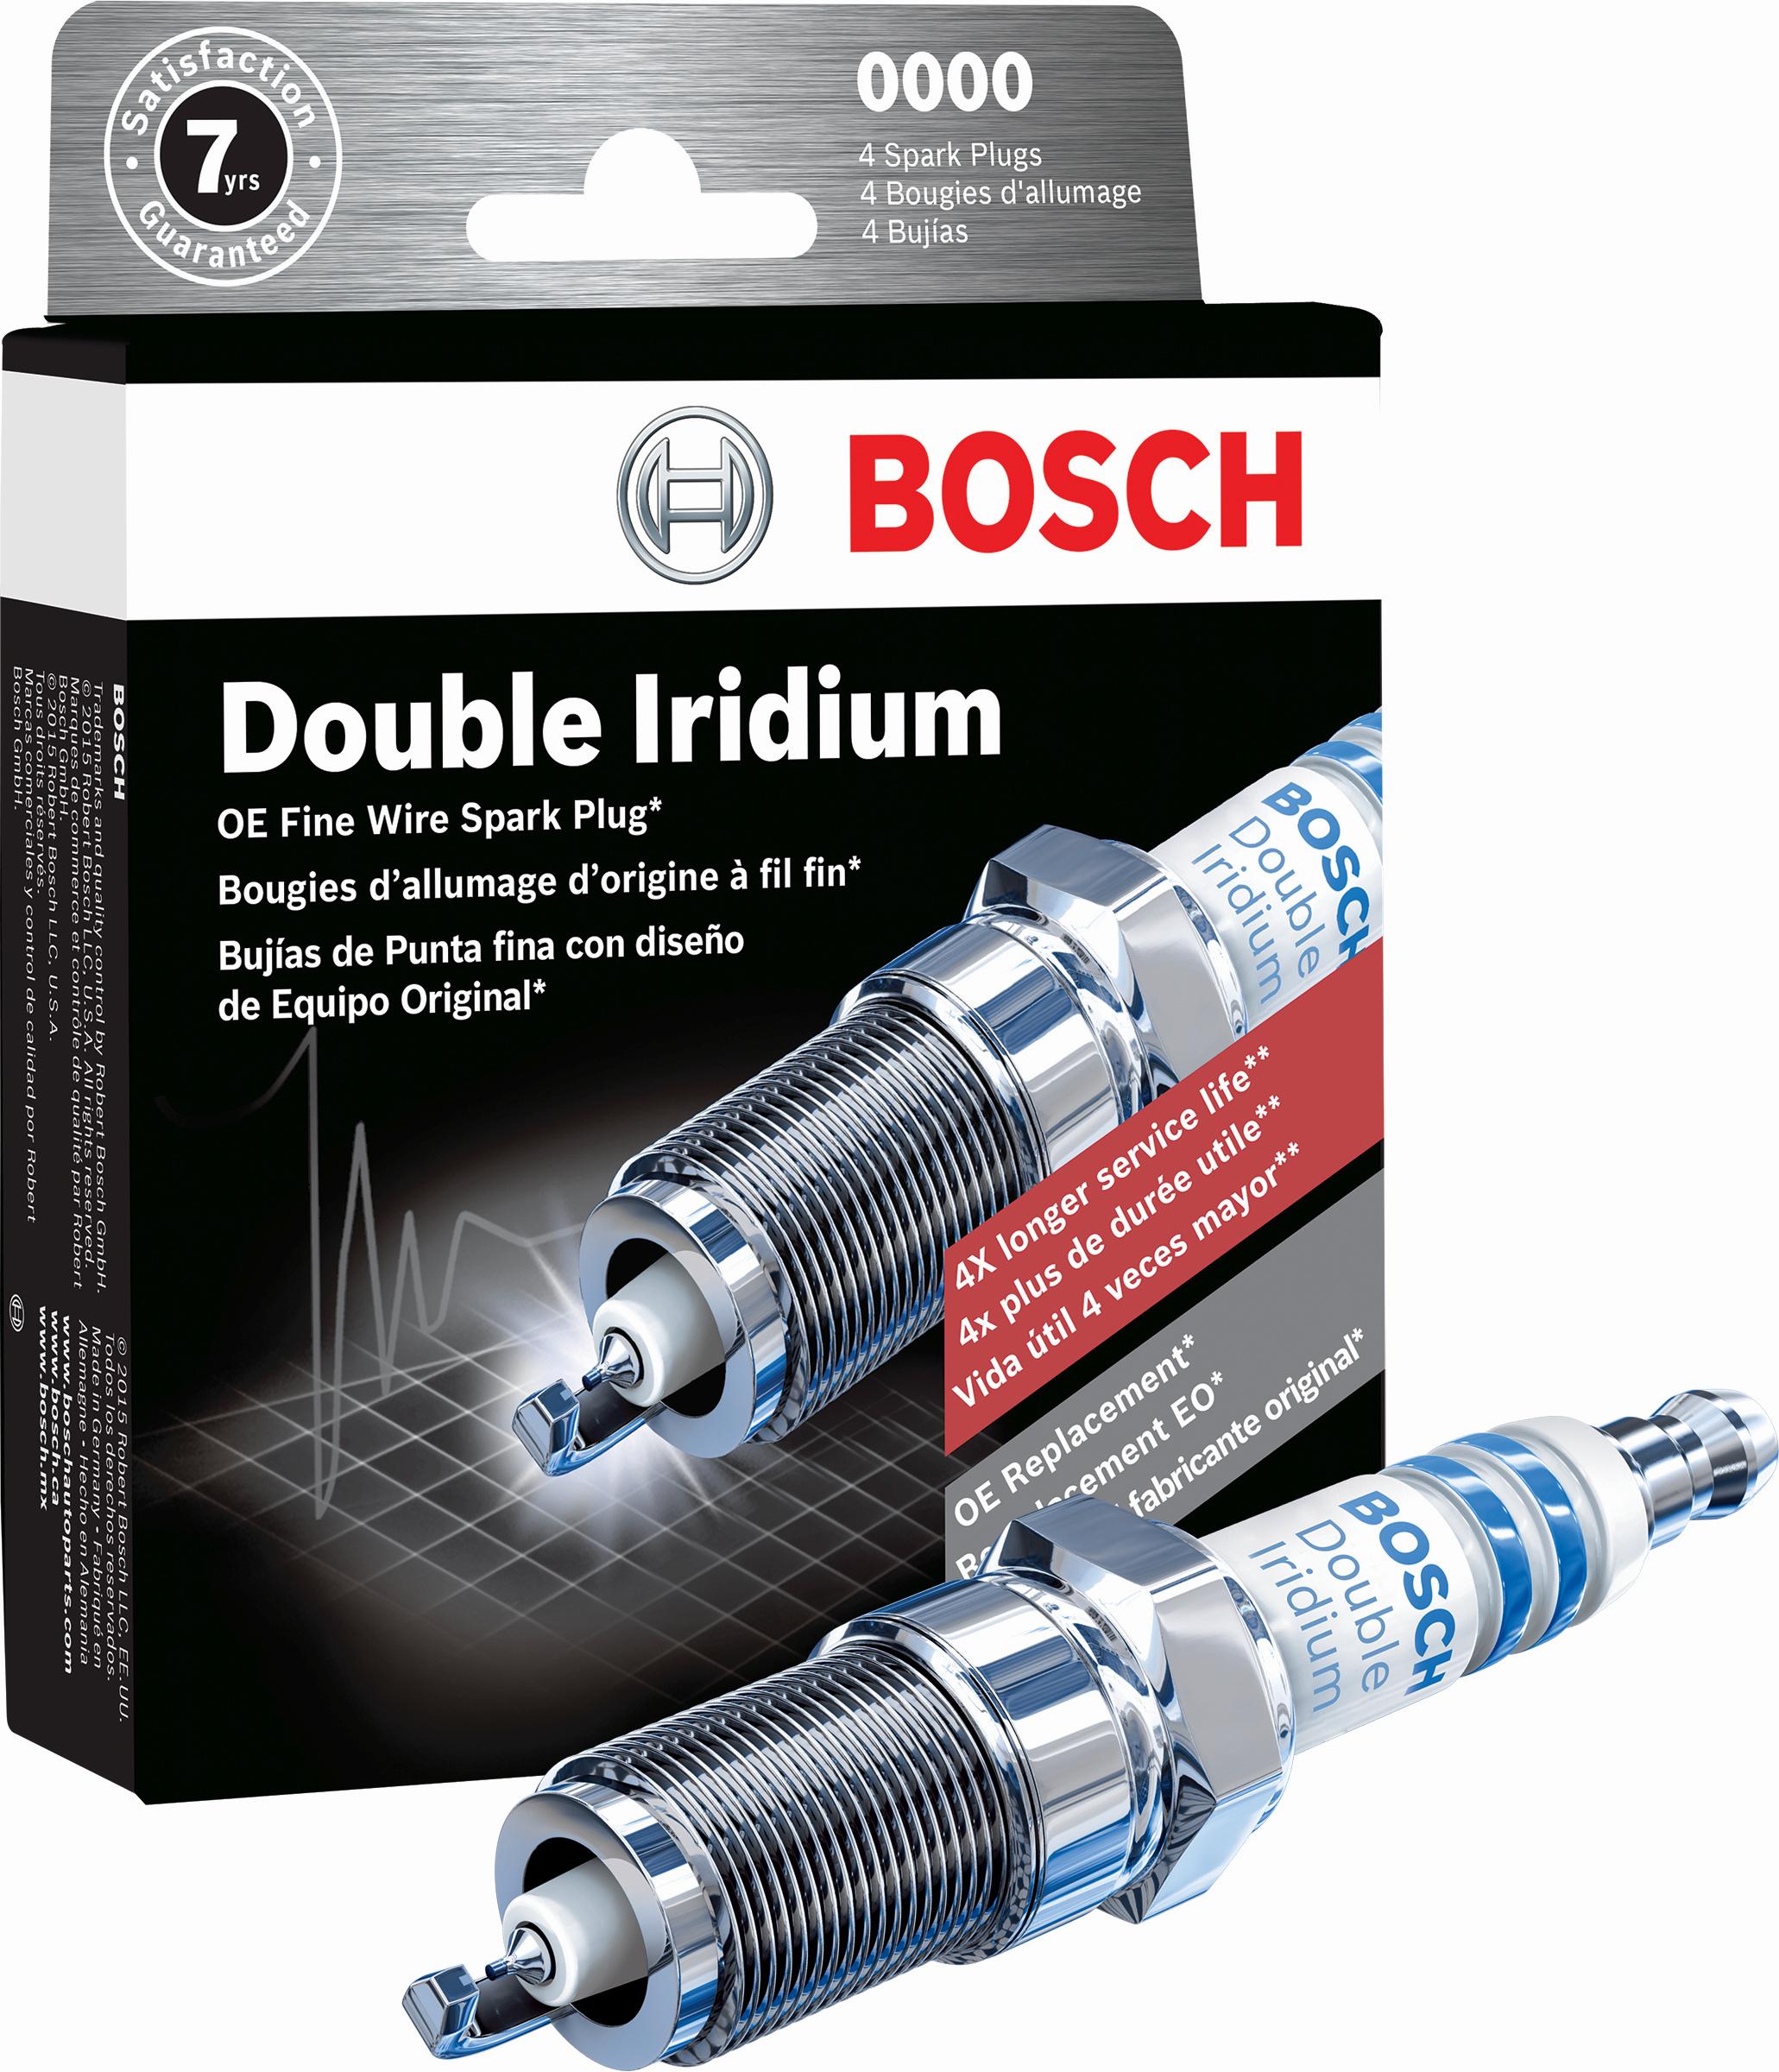 Bosch Launches Fine Wire Double Iridium Spark Plugs